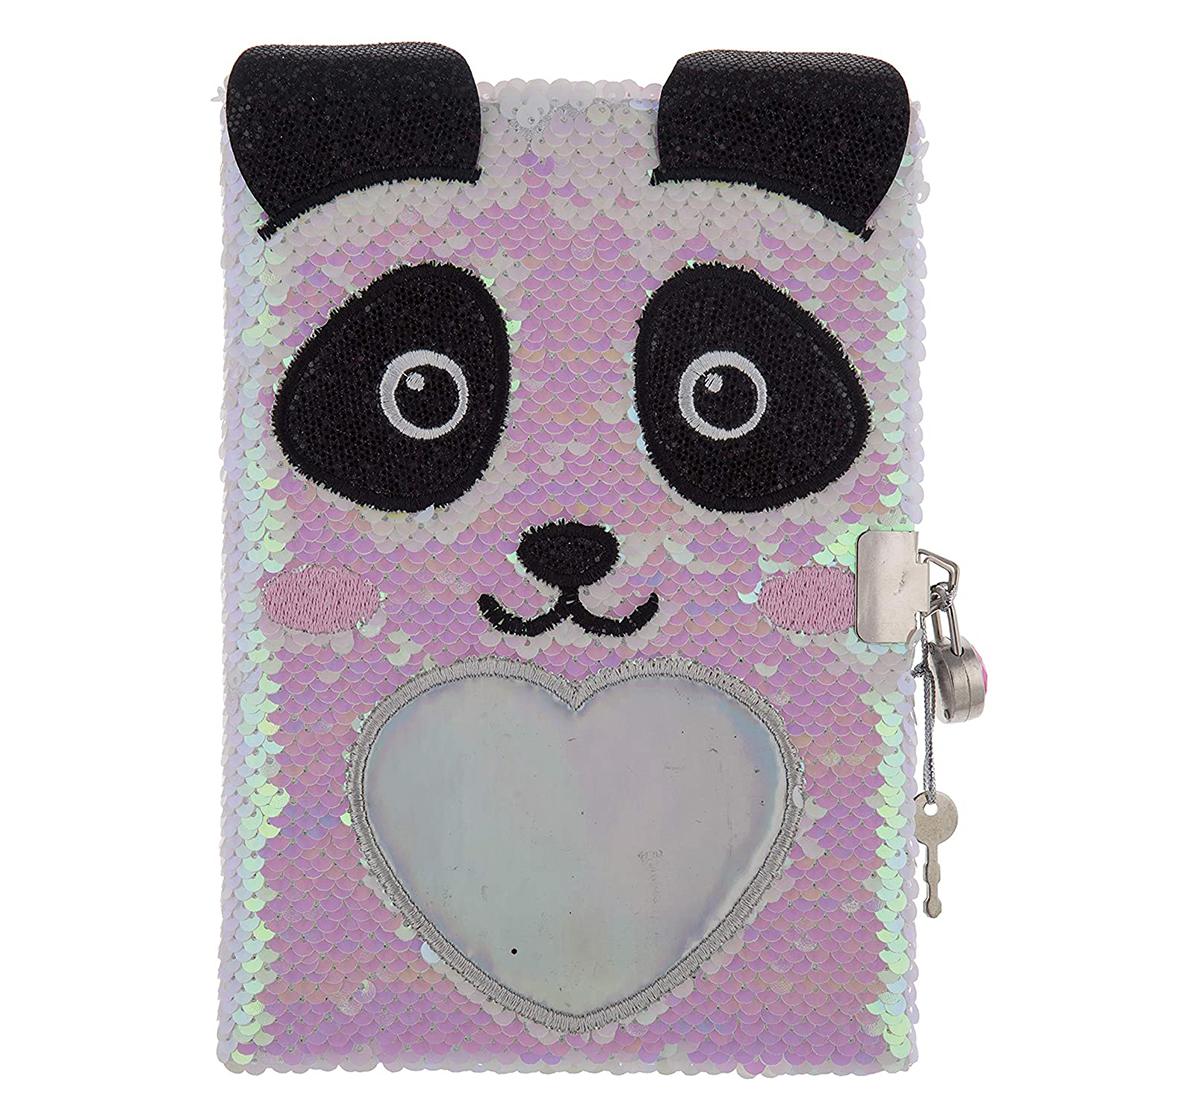 Mirada | Mirada Panda Flip Sequin Notebook/Diary Study & Desk Accessories for Girls age 3Y+ (White)